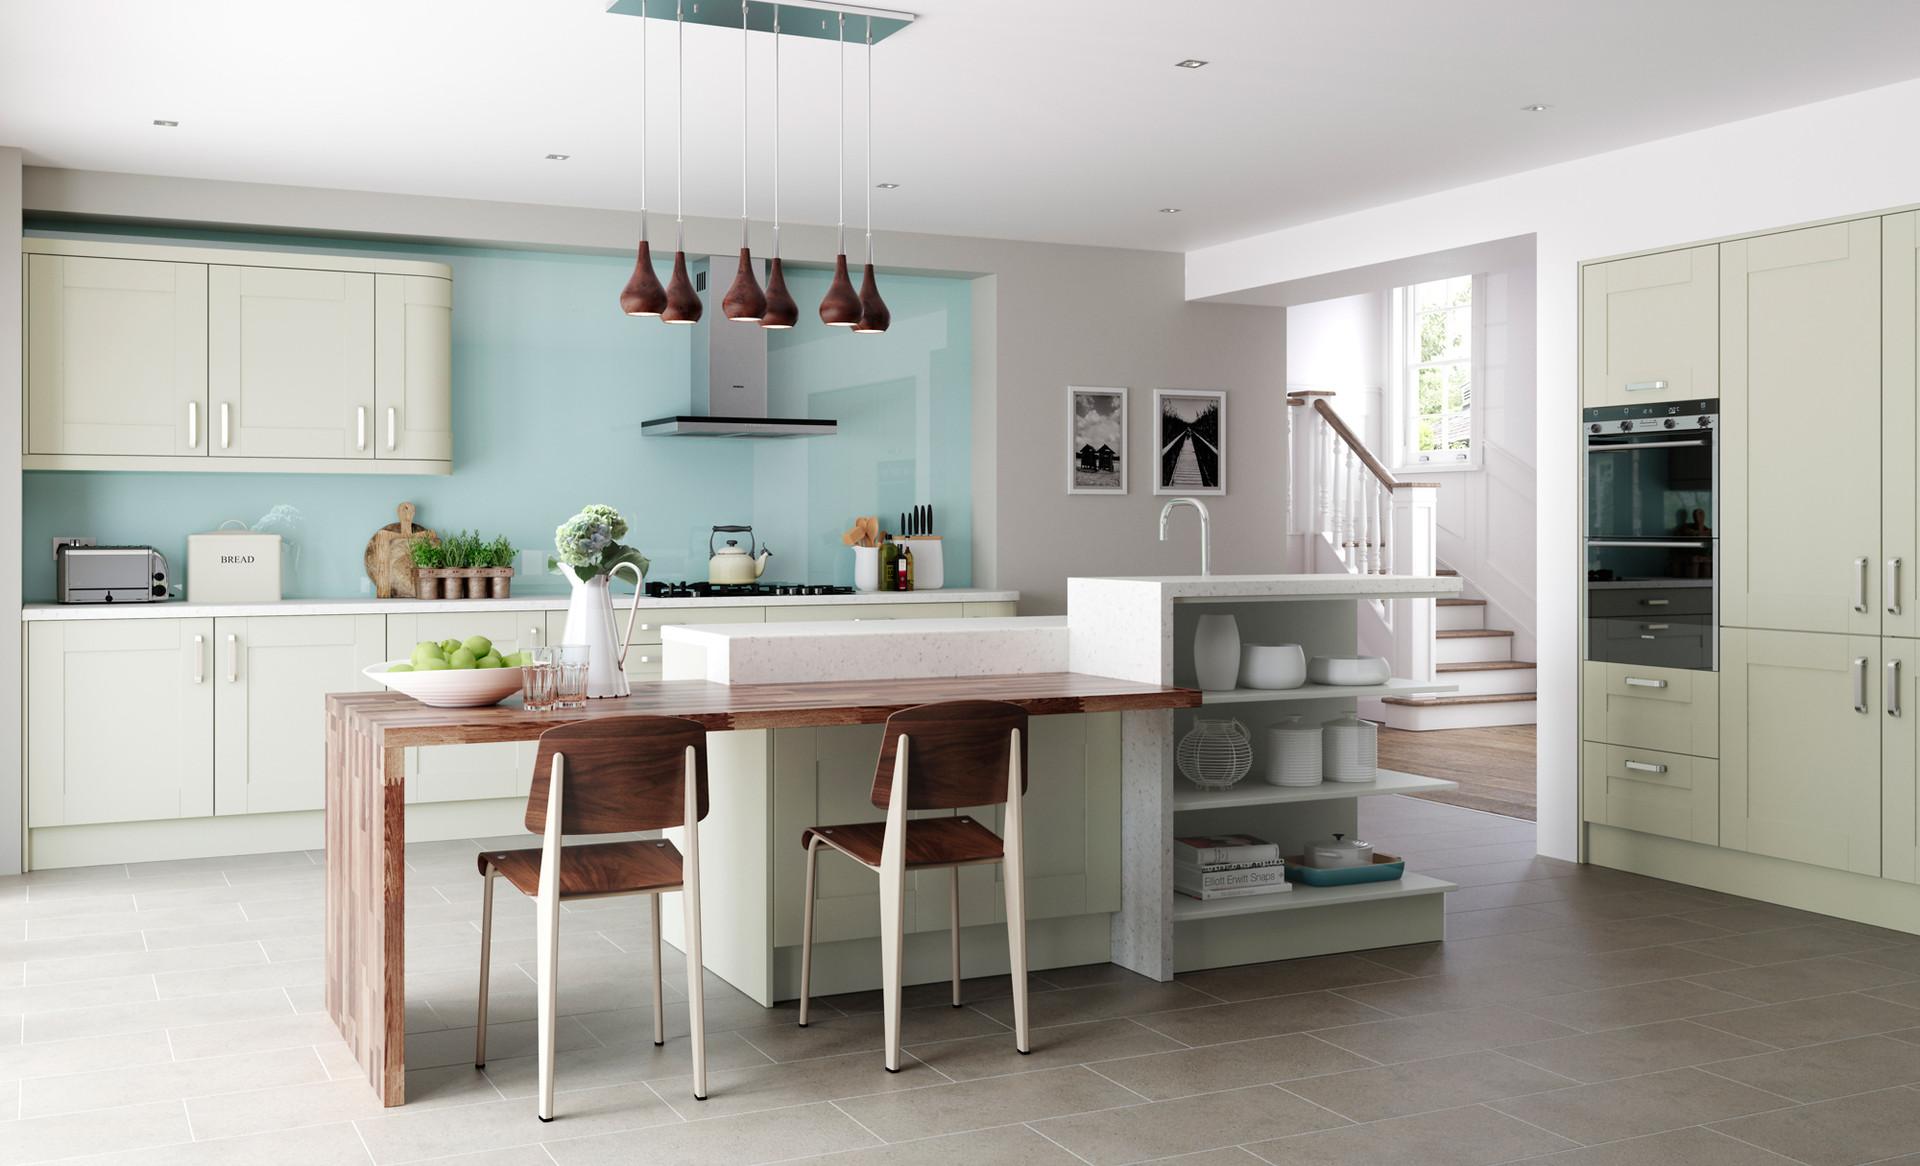 Windsor shaker Mussel kitchen